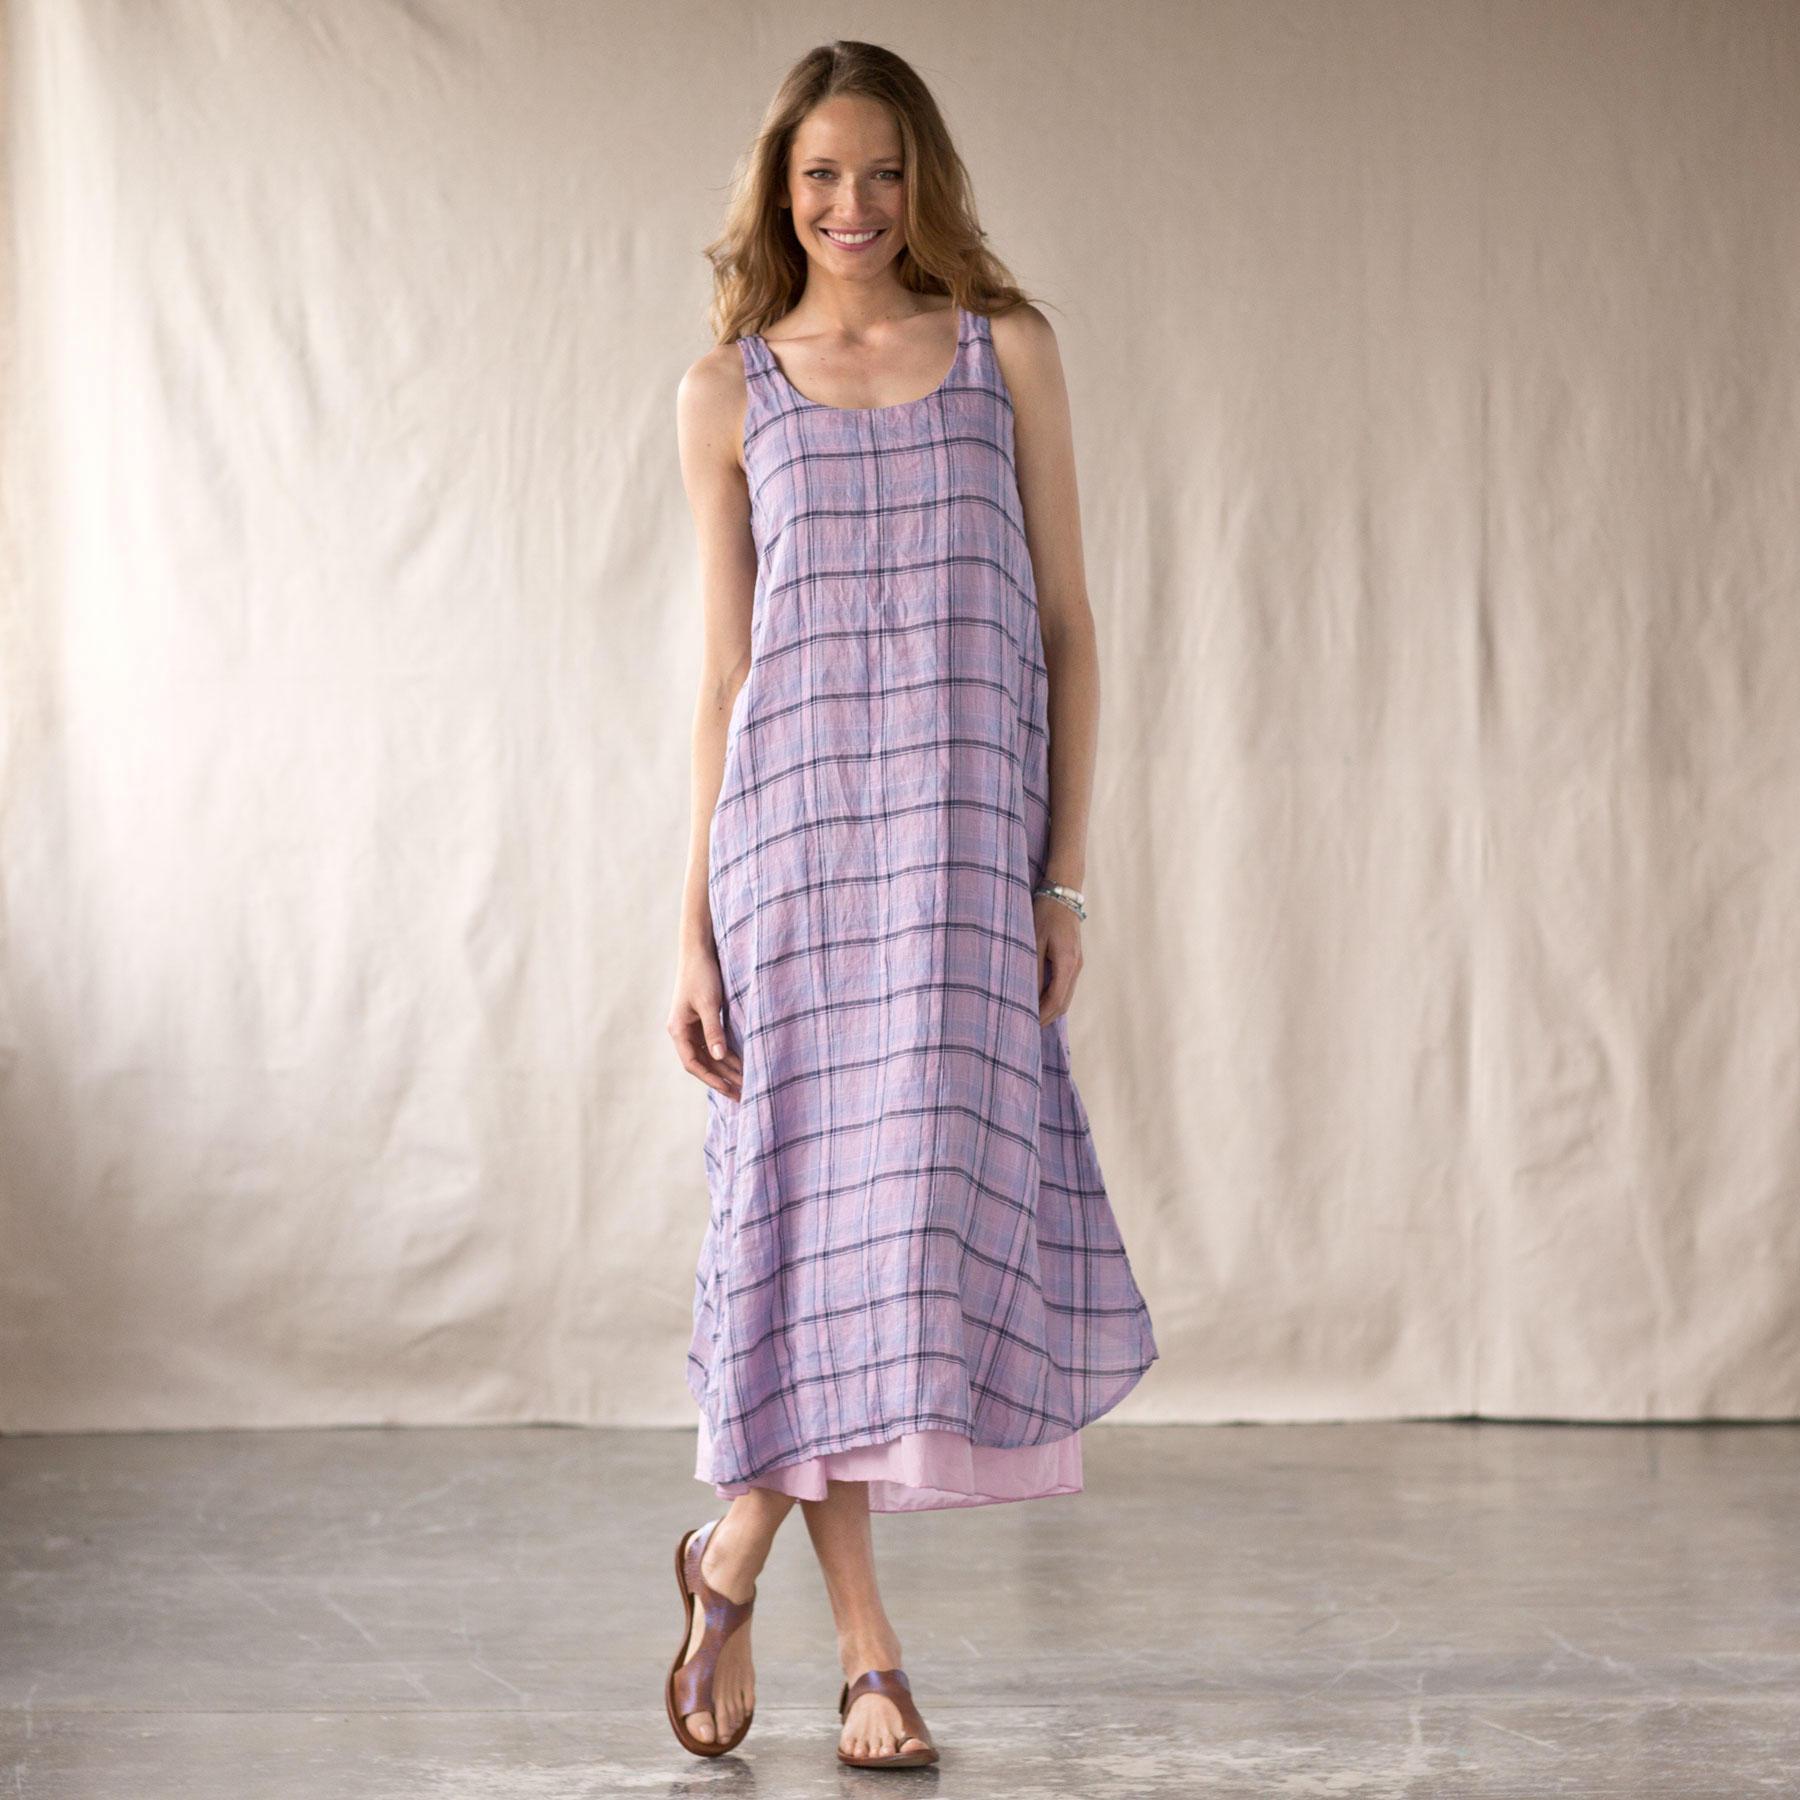 CP Shades Dress, Morning Breeze